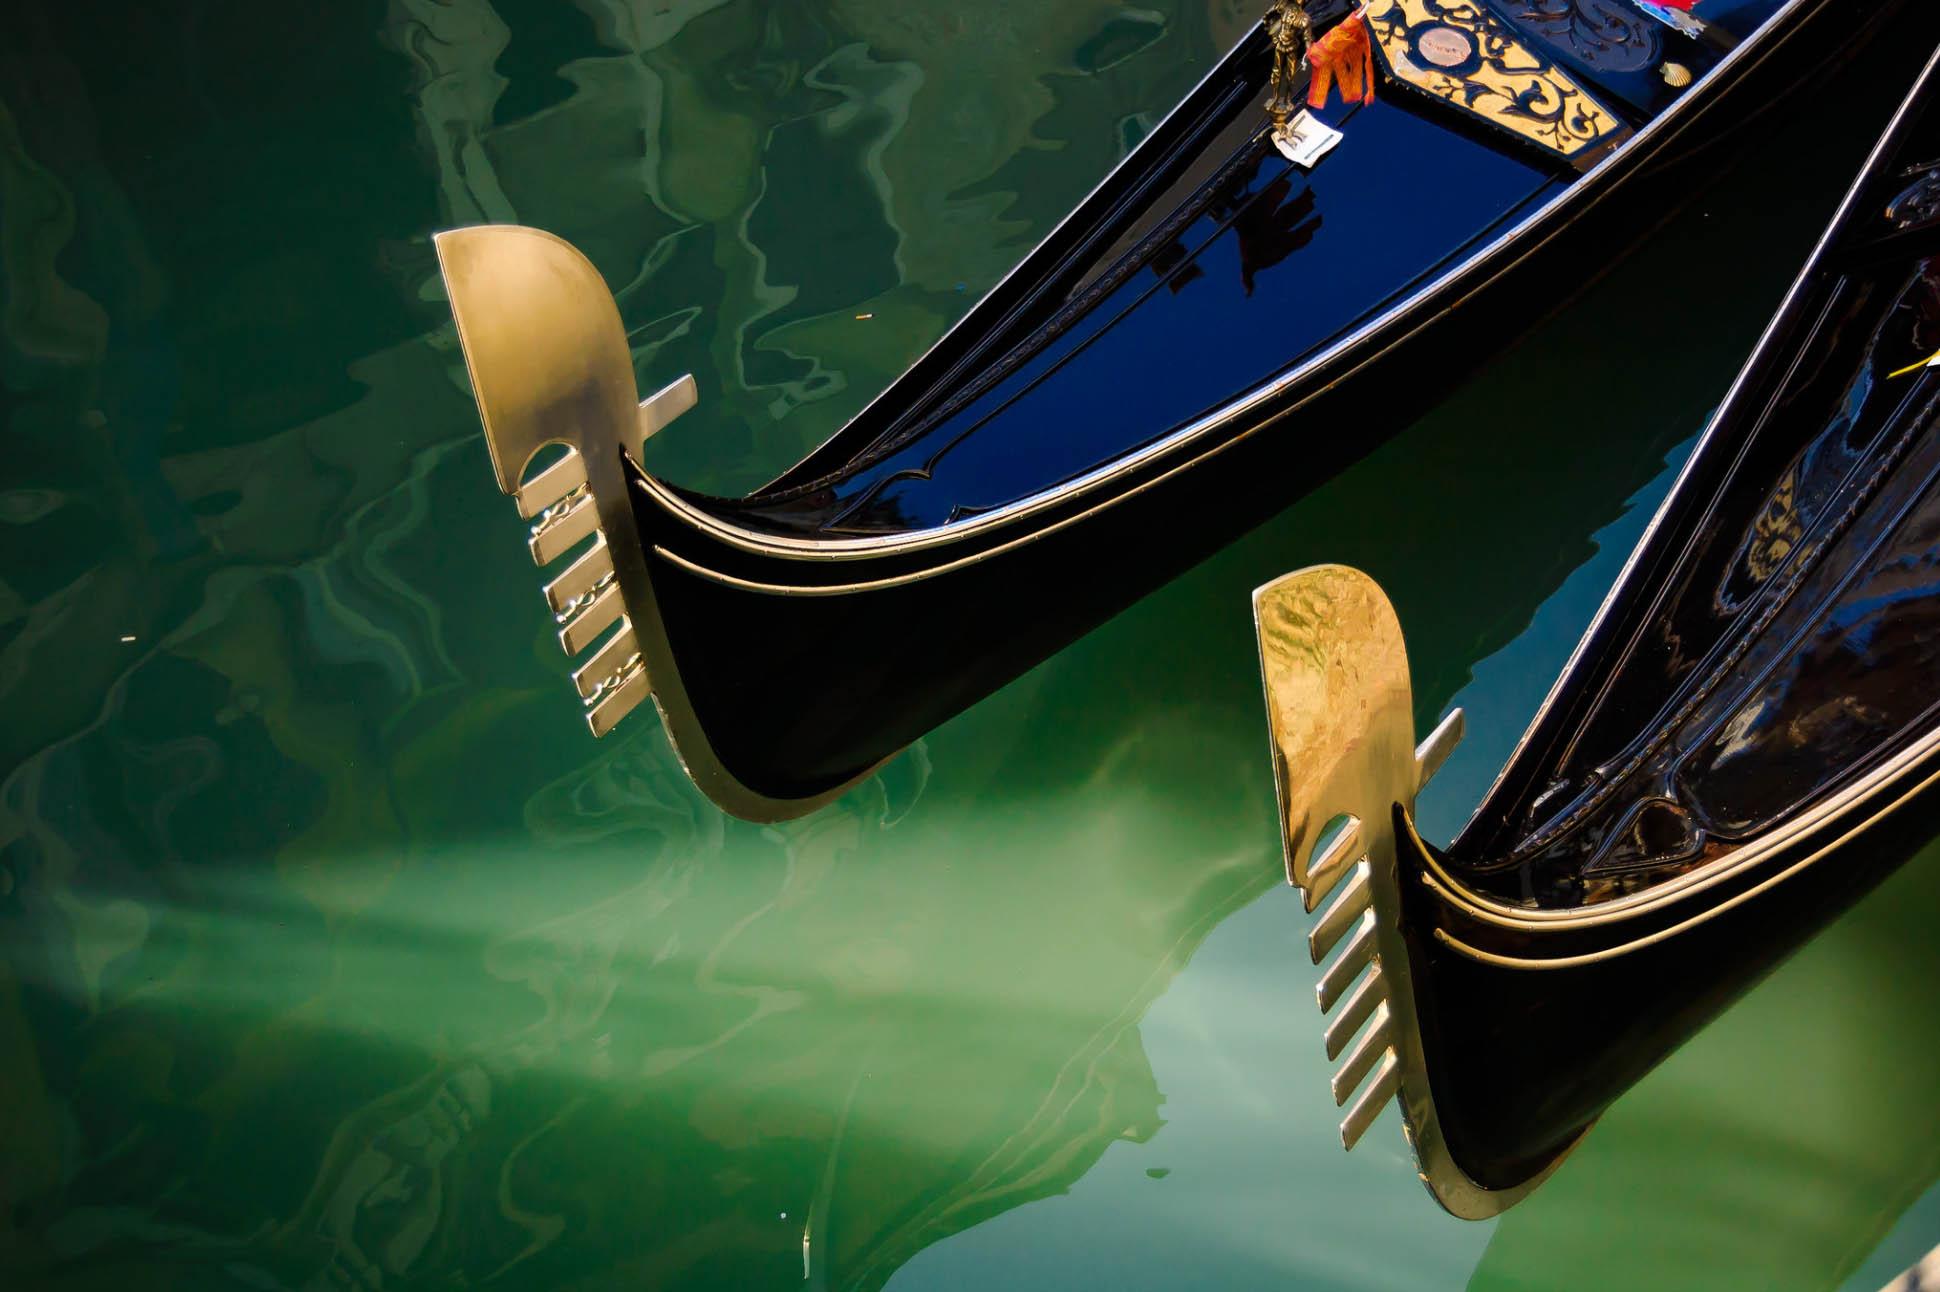 Gondolas Venezia - Luxury private tour of Venice